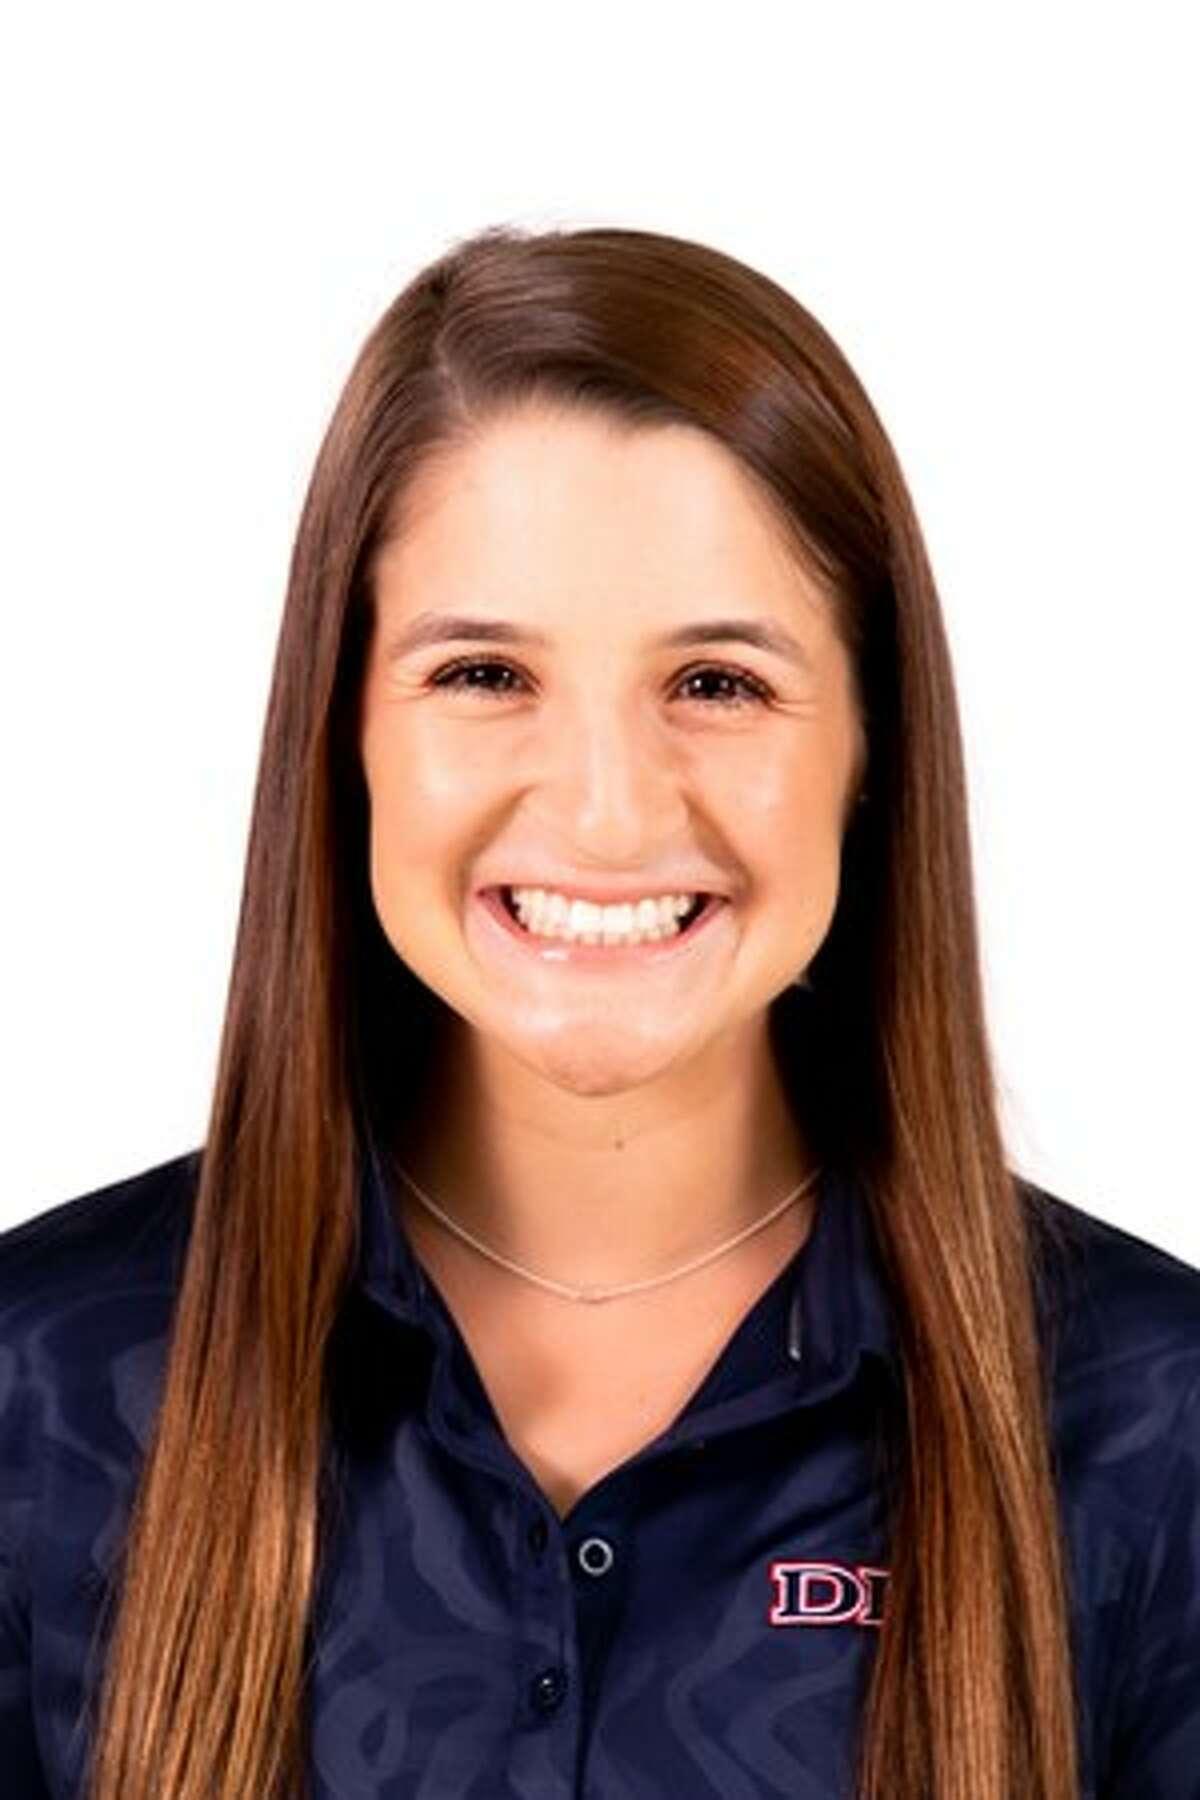 Dallas Baptist University golfer Faith DeLaGarza